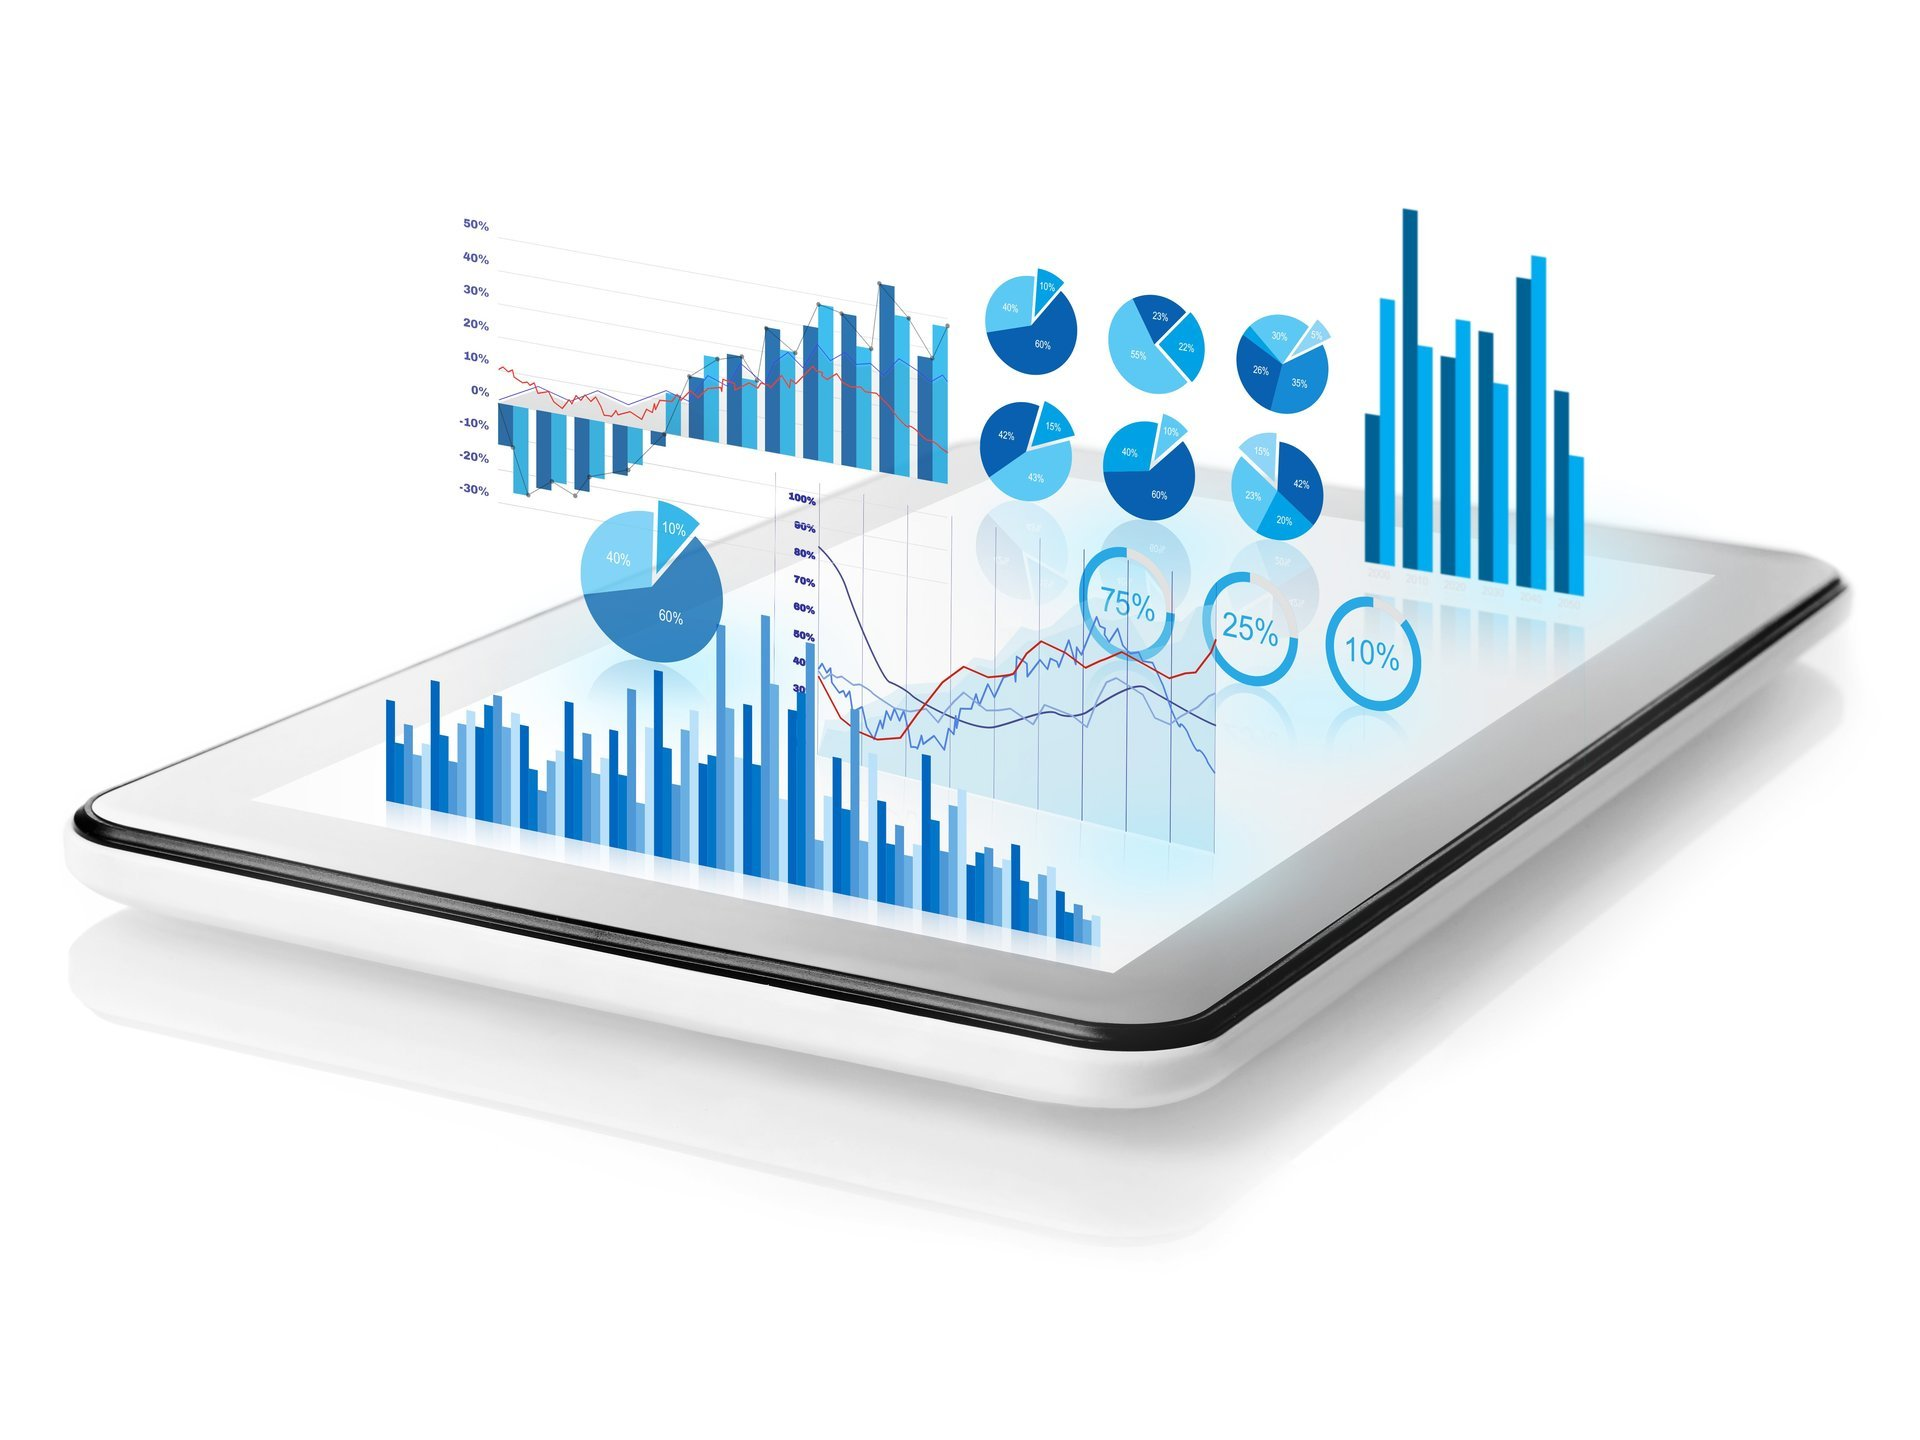 example visualisation of chart analysis